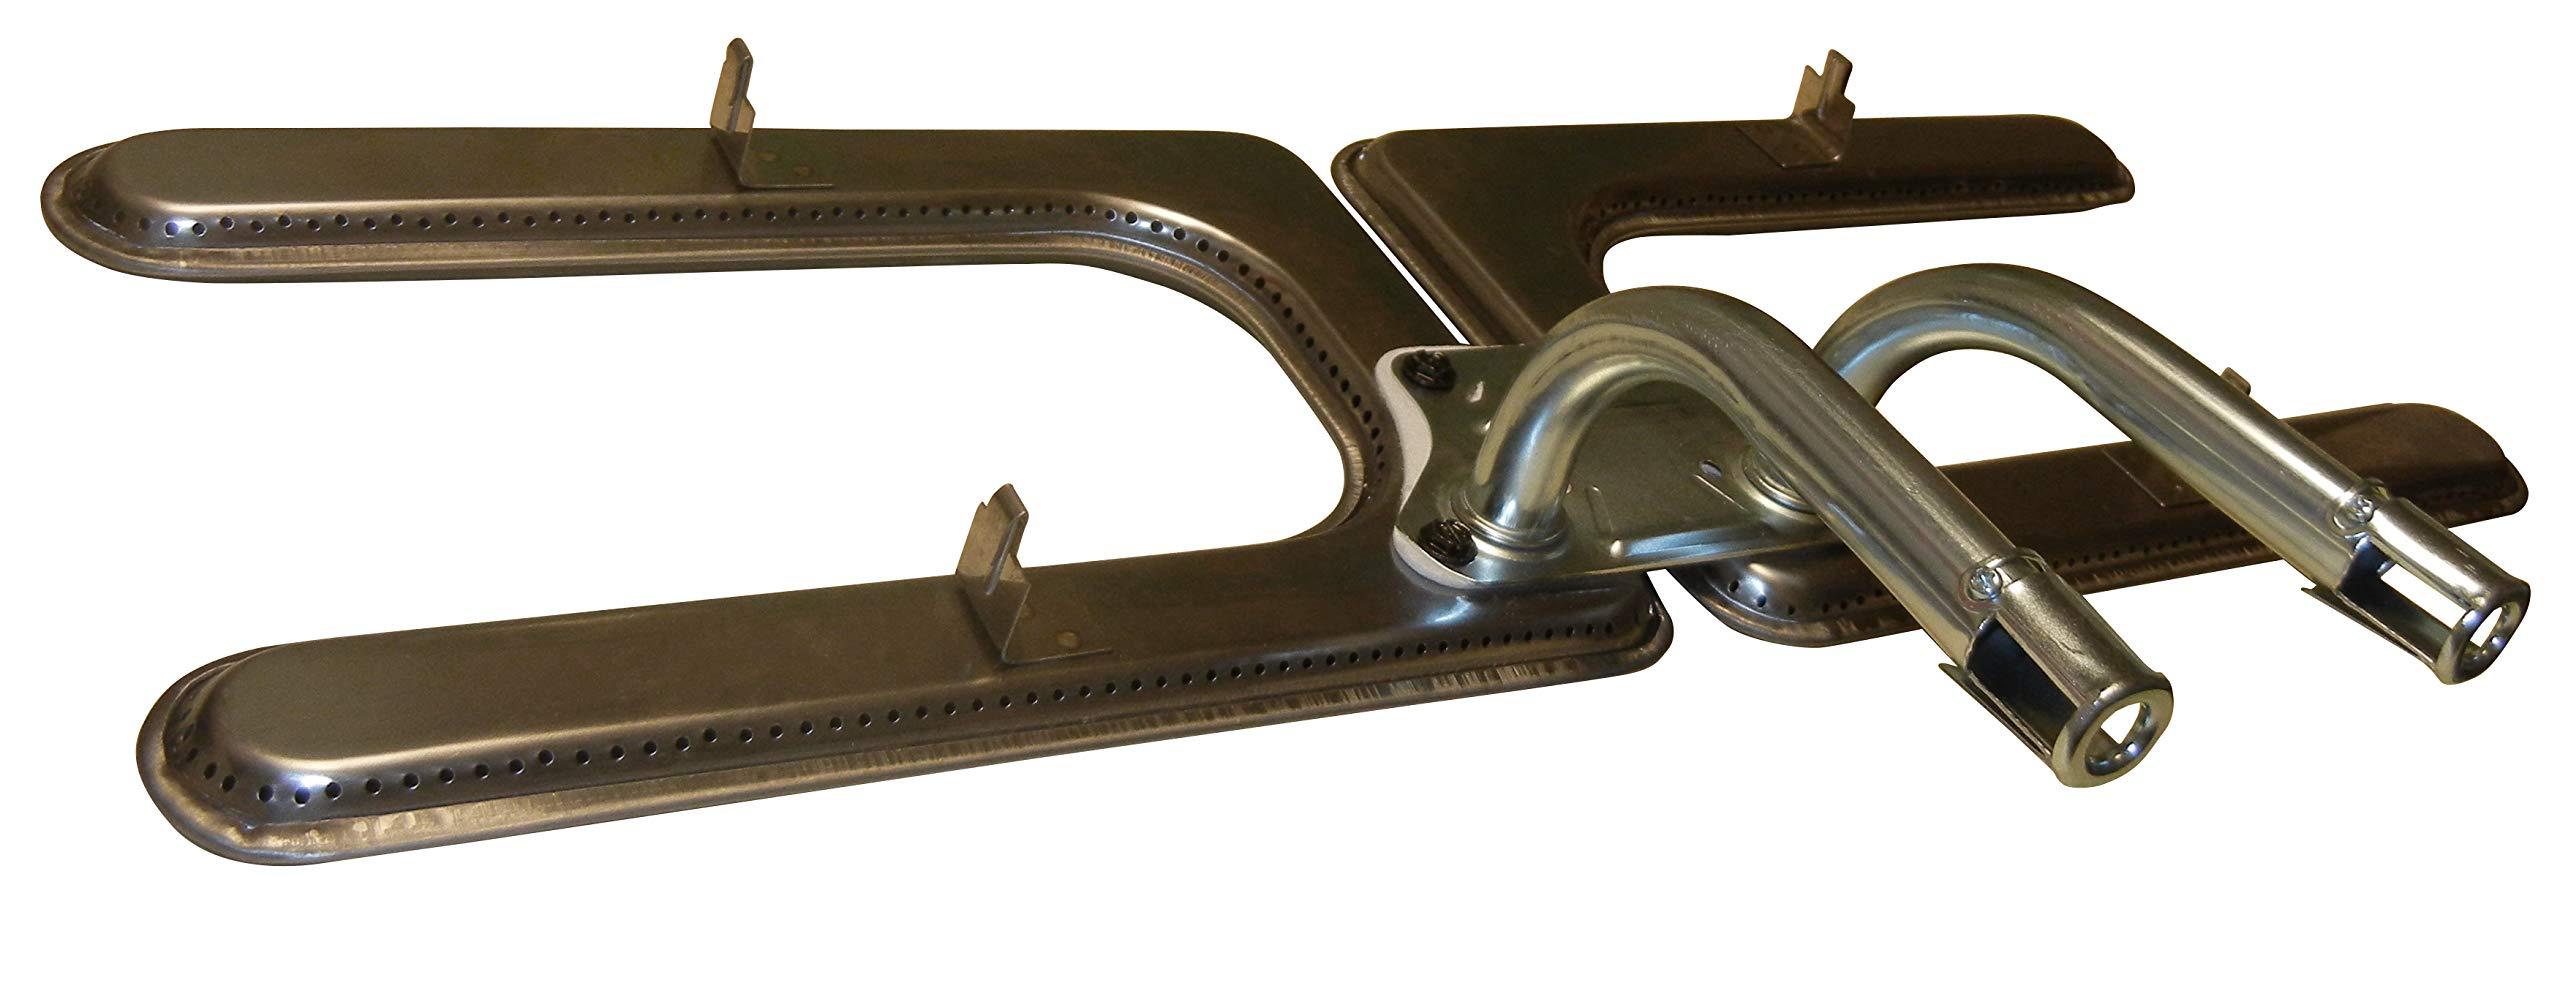 Stainless Steel Burner and Venturi for Fiesta Grills